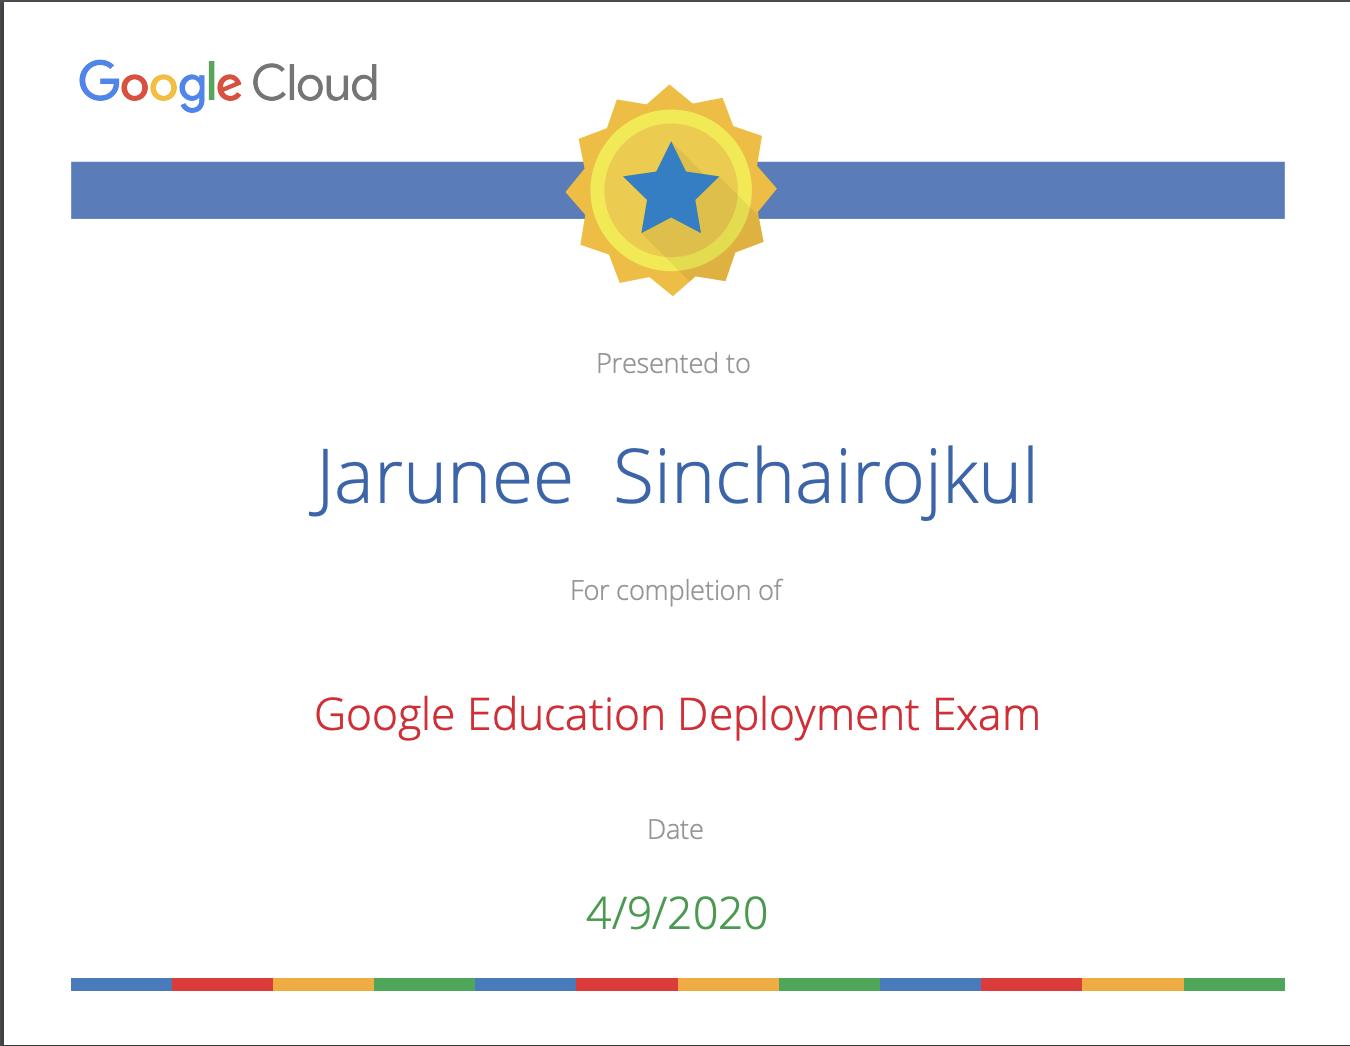 Google Education Deployment Exam